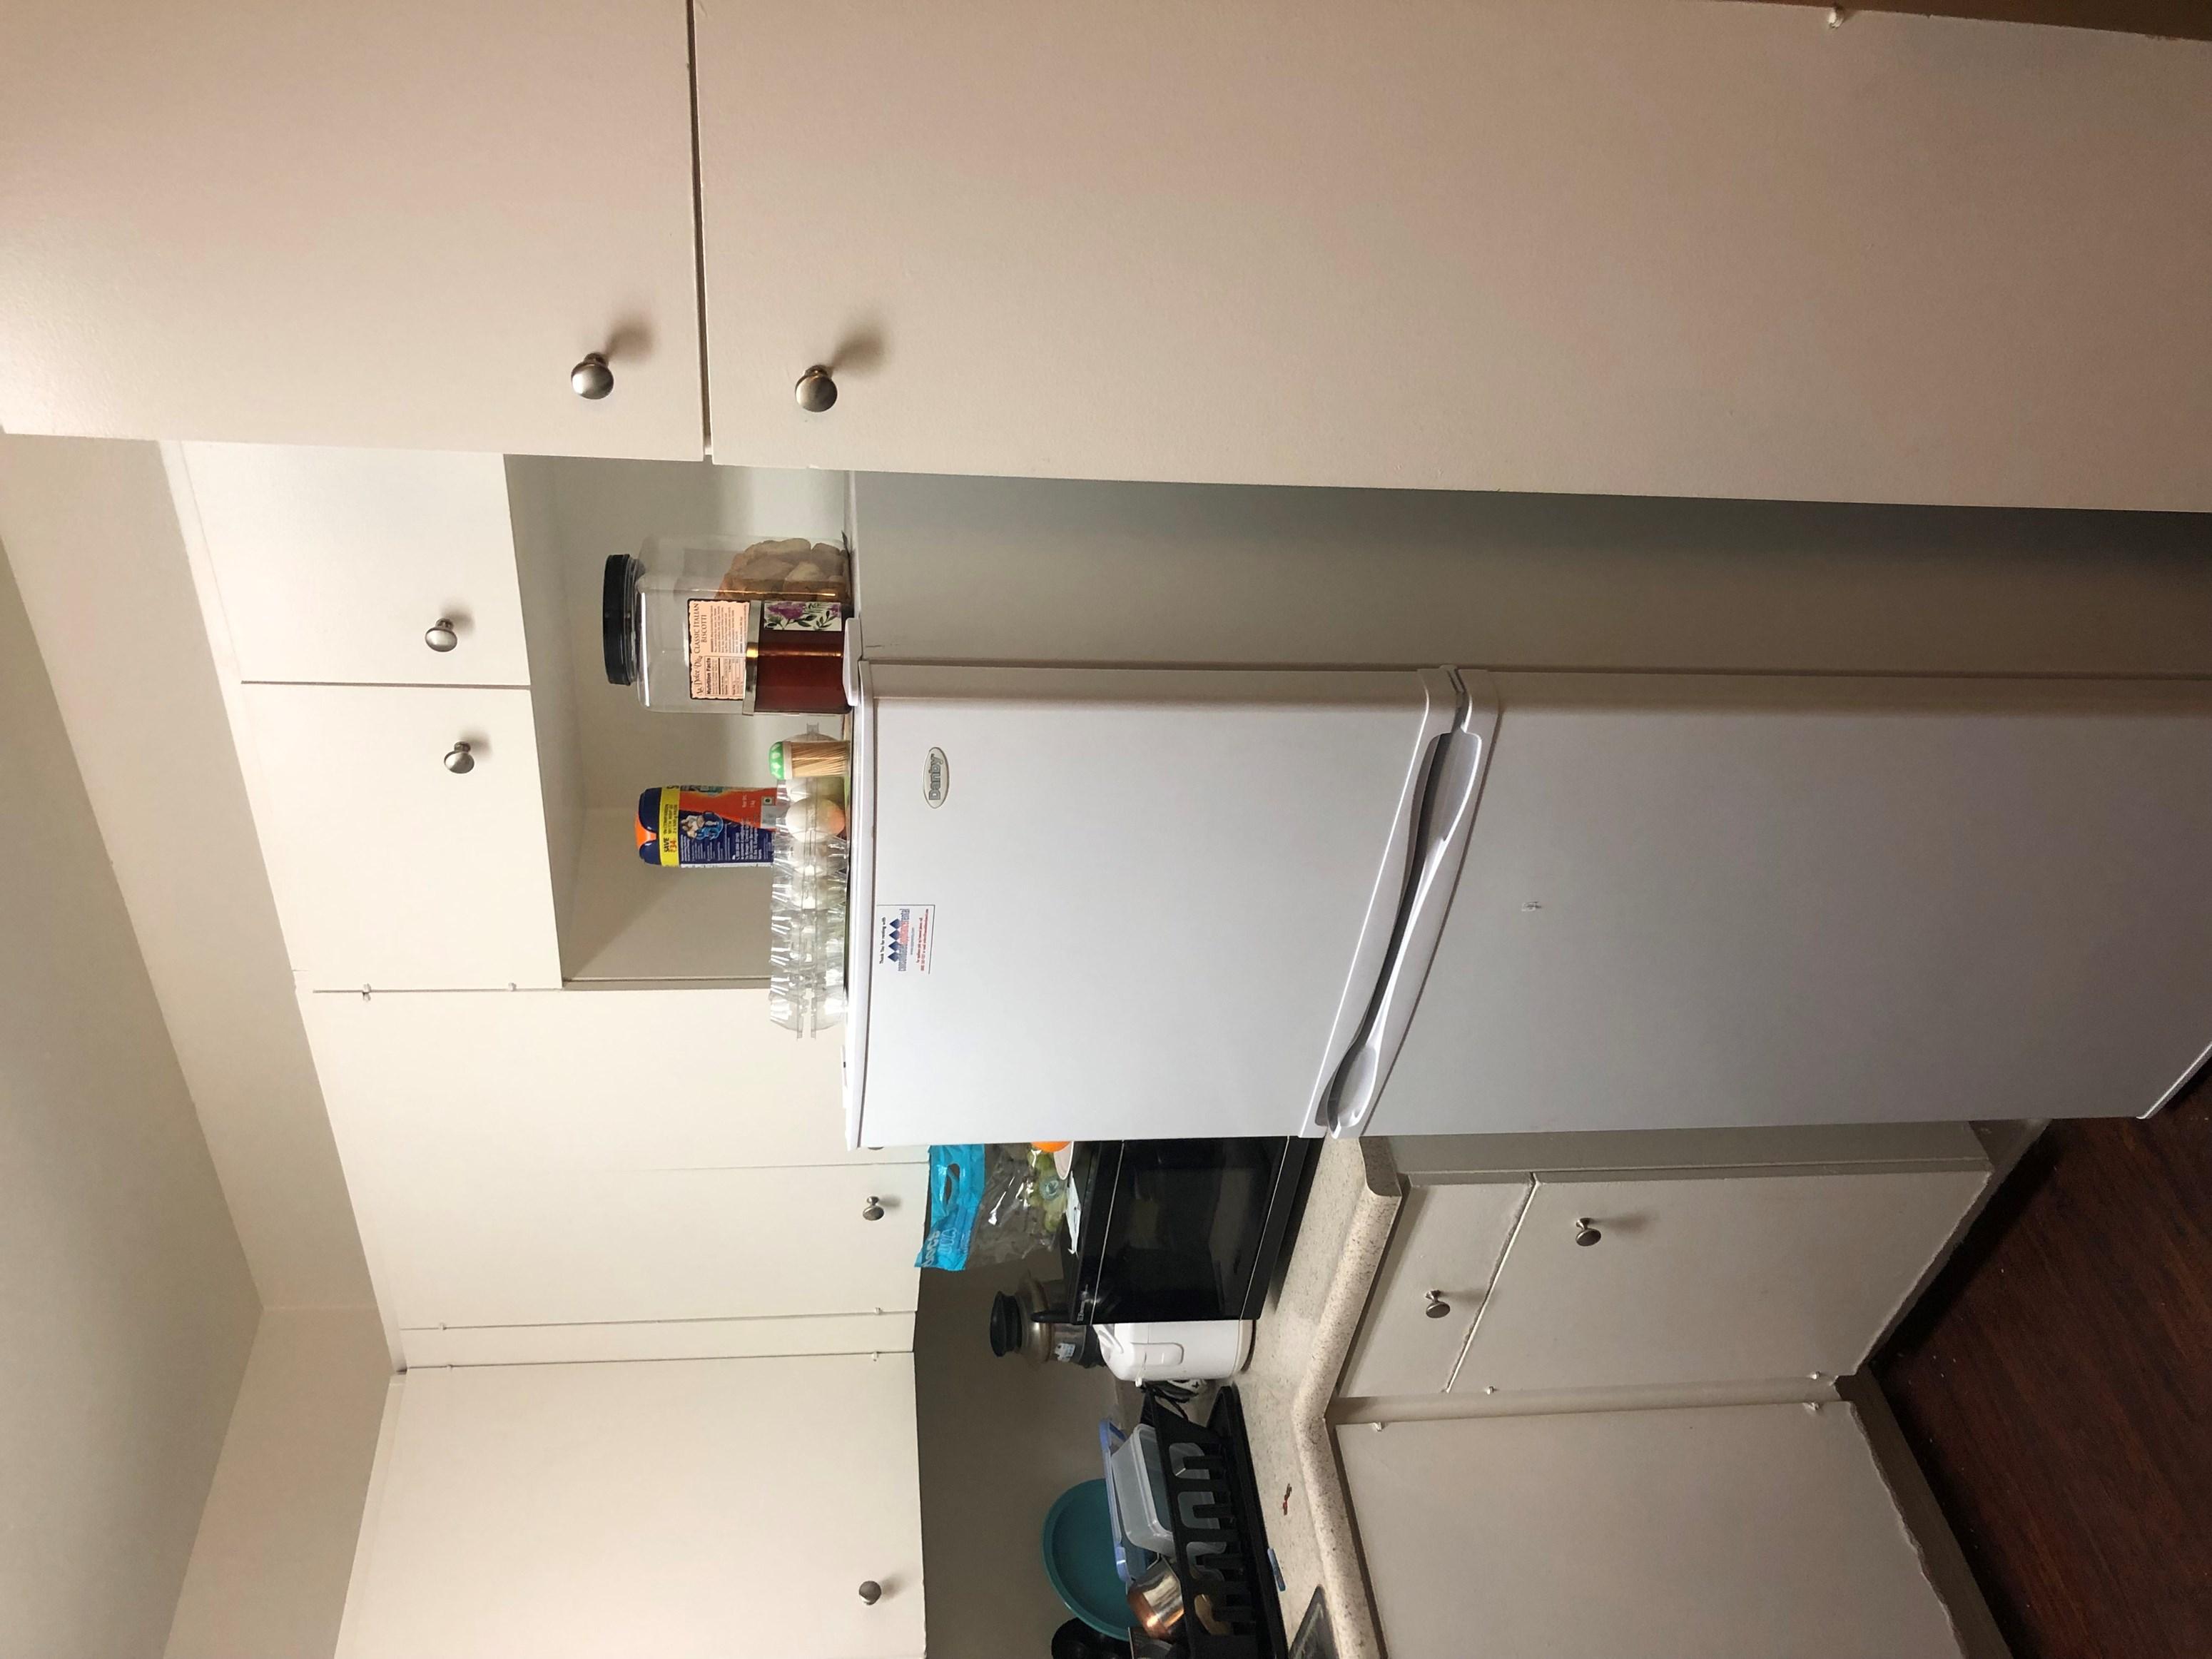 Lease Transfer 1 Bed1 Bath Apartment In Glendaleca 1 Bhk